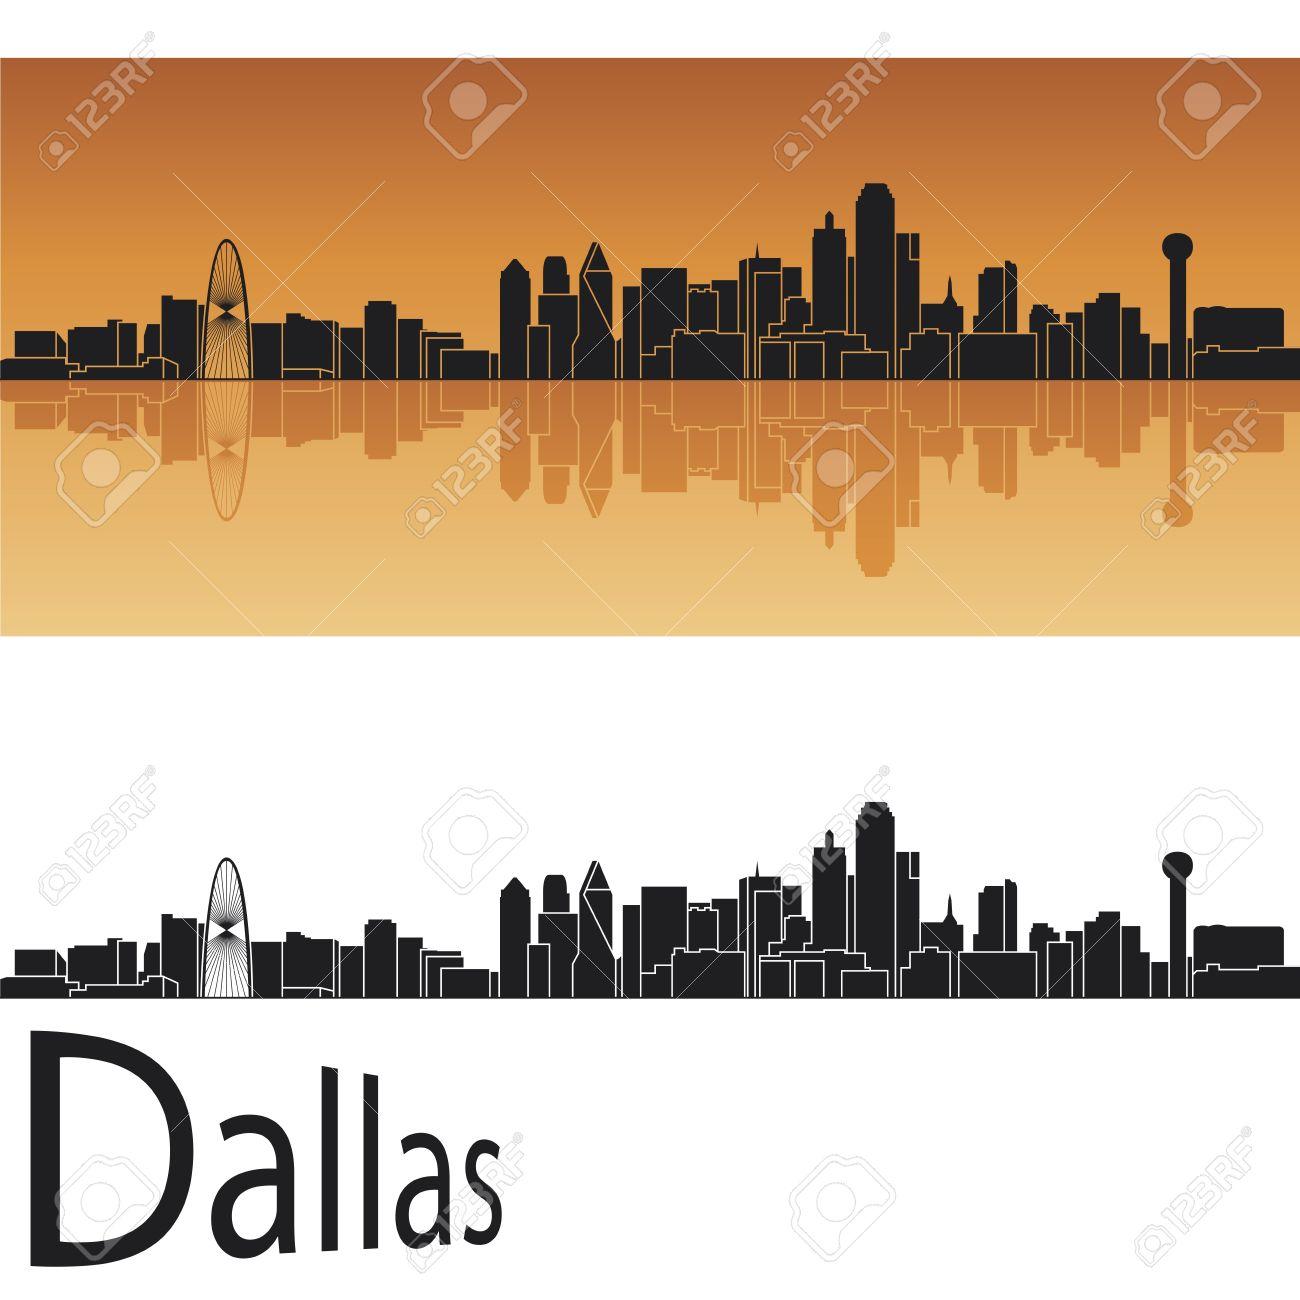 Dallas skyline in orange background in editable vector file Stock Vector - 14269281